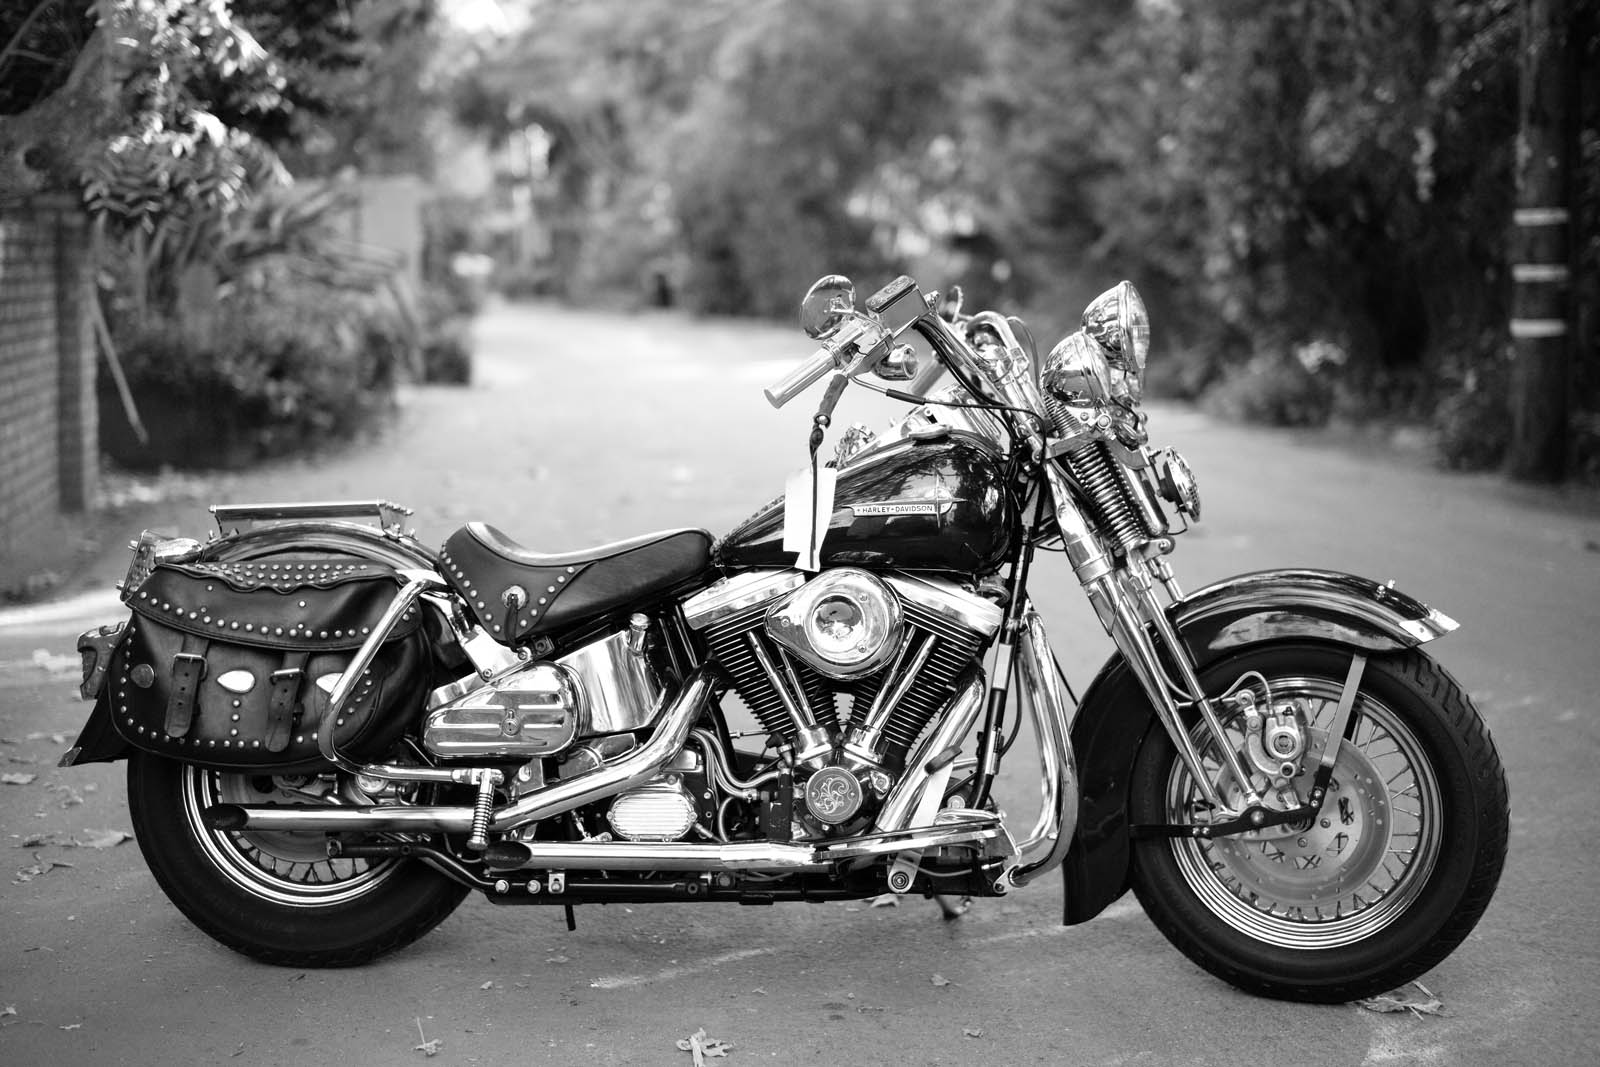 126+1989+Harley+Davidson+Softail+Springer+1340+cc+%C2%A9+Artcurial+Motorcars+%C2%A9Mathieu+Ce%CC%81sar+copy